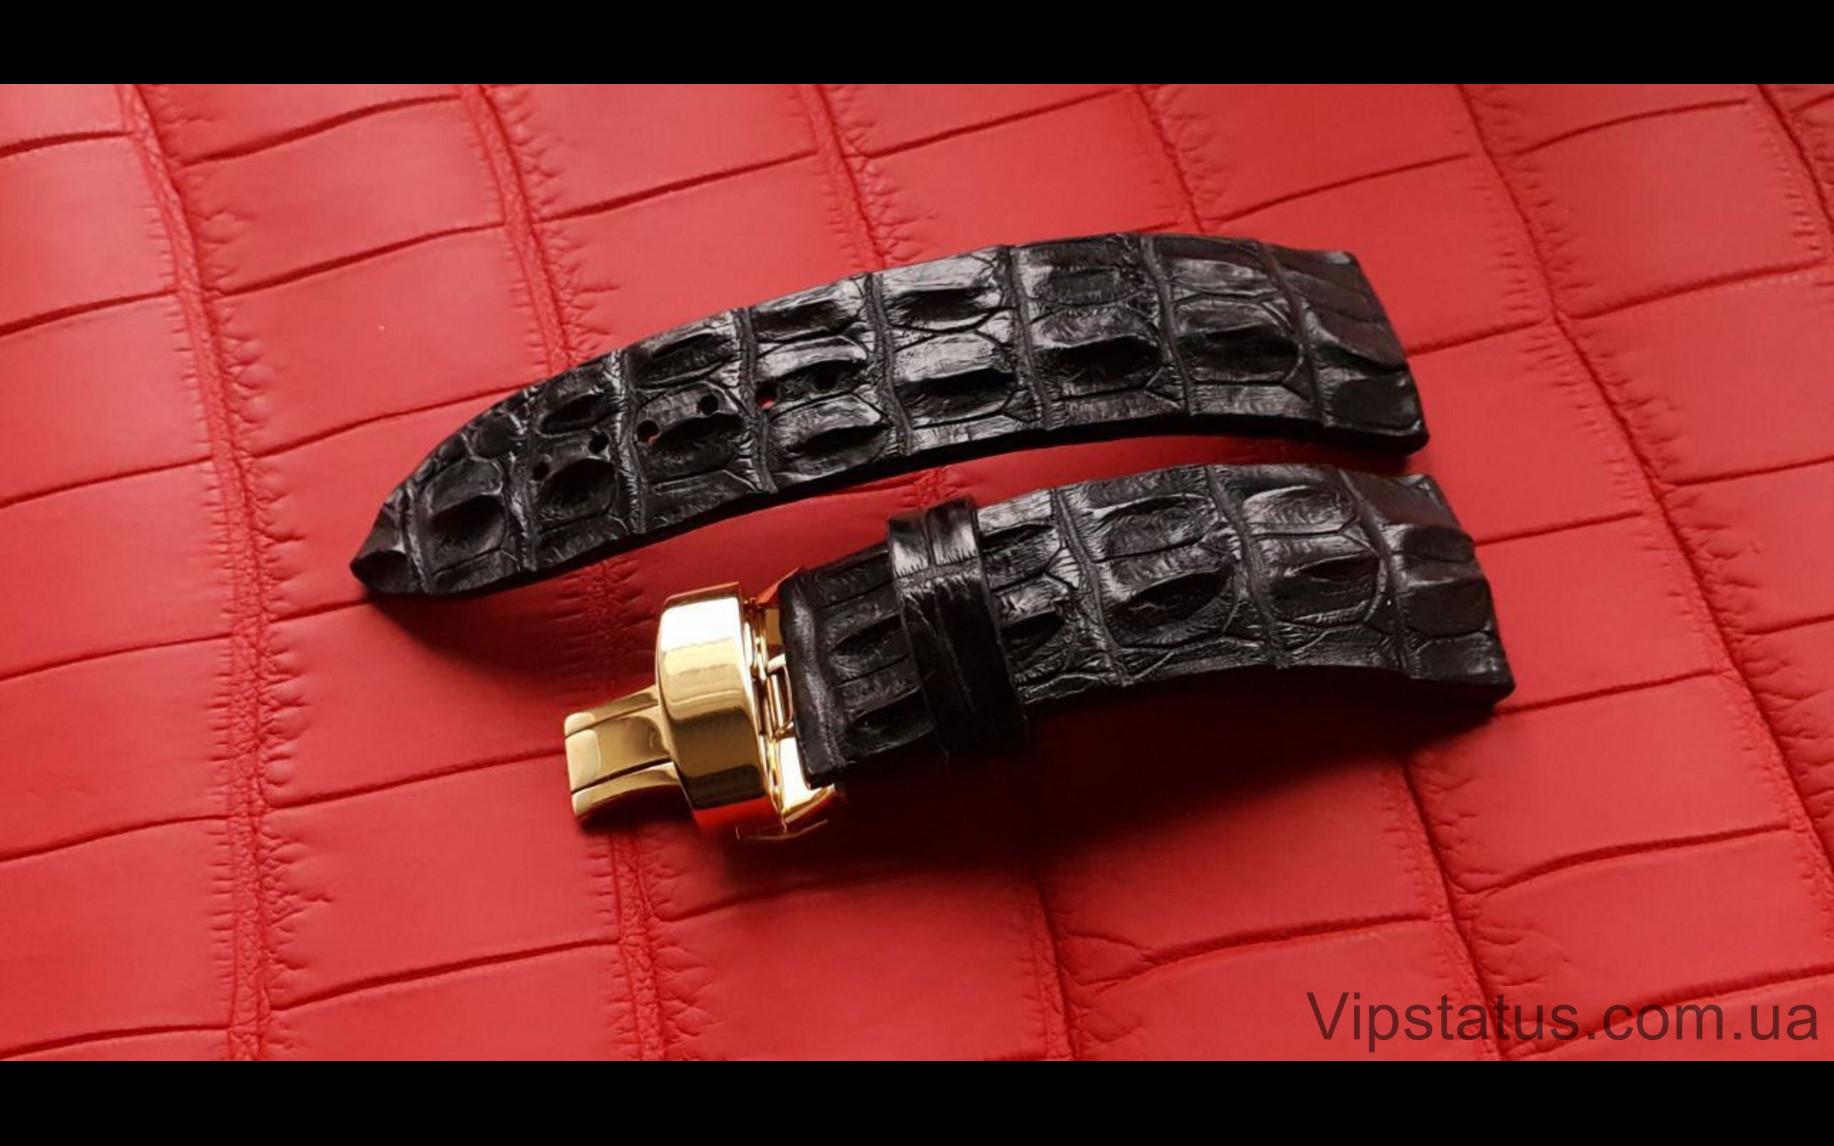 Elite Элитный ремешок для часов Girard-Perregaux кожа крокодила Elite Crocodile Strap for Girard-Perregaux watches image 2